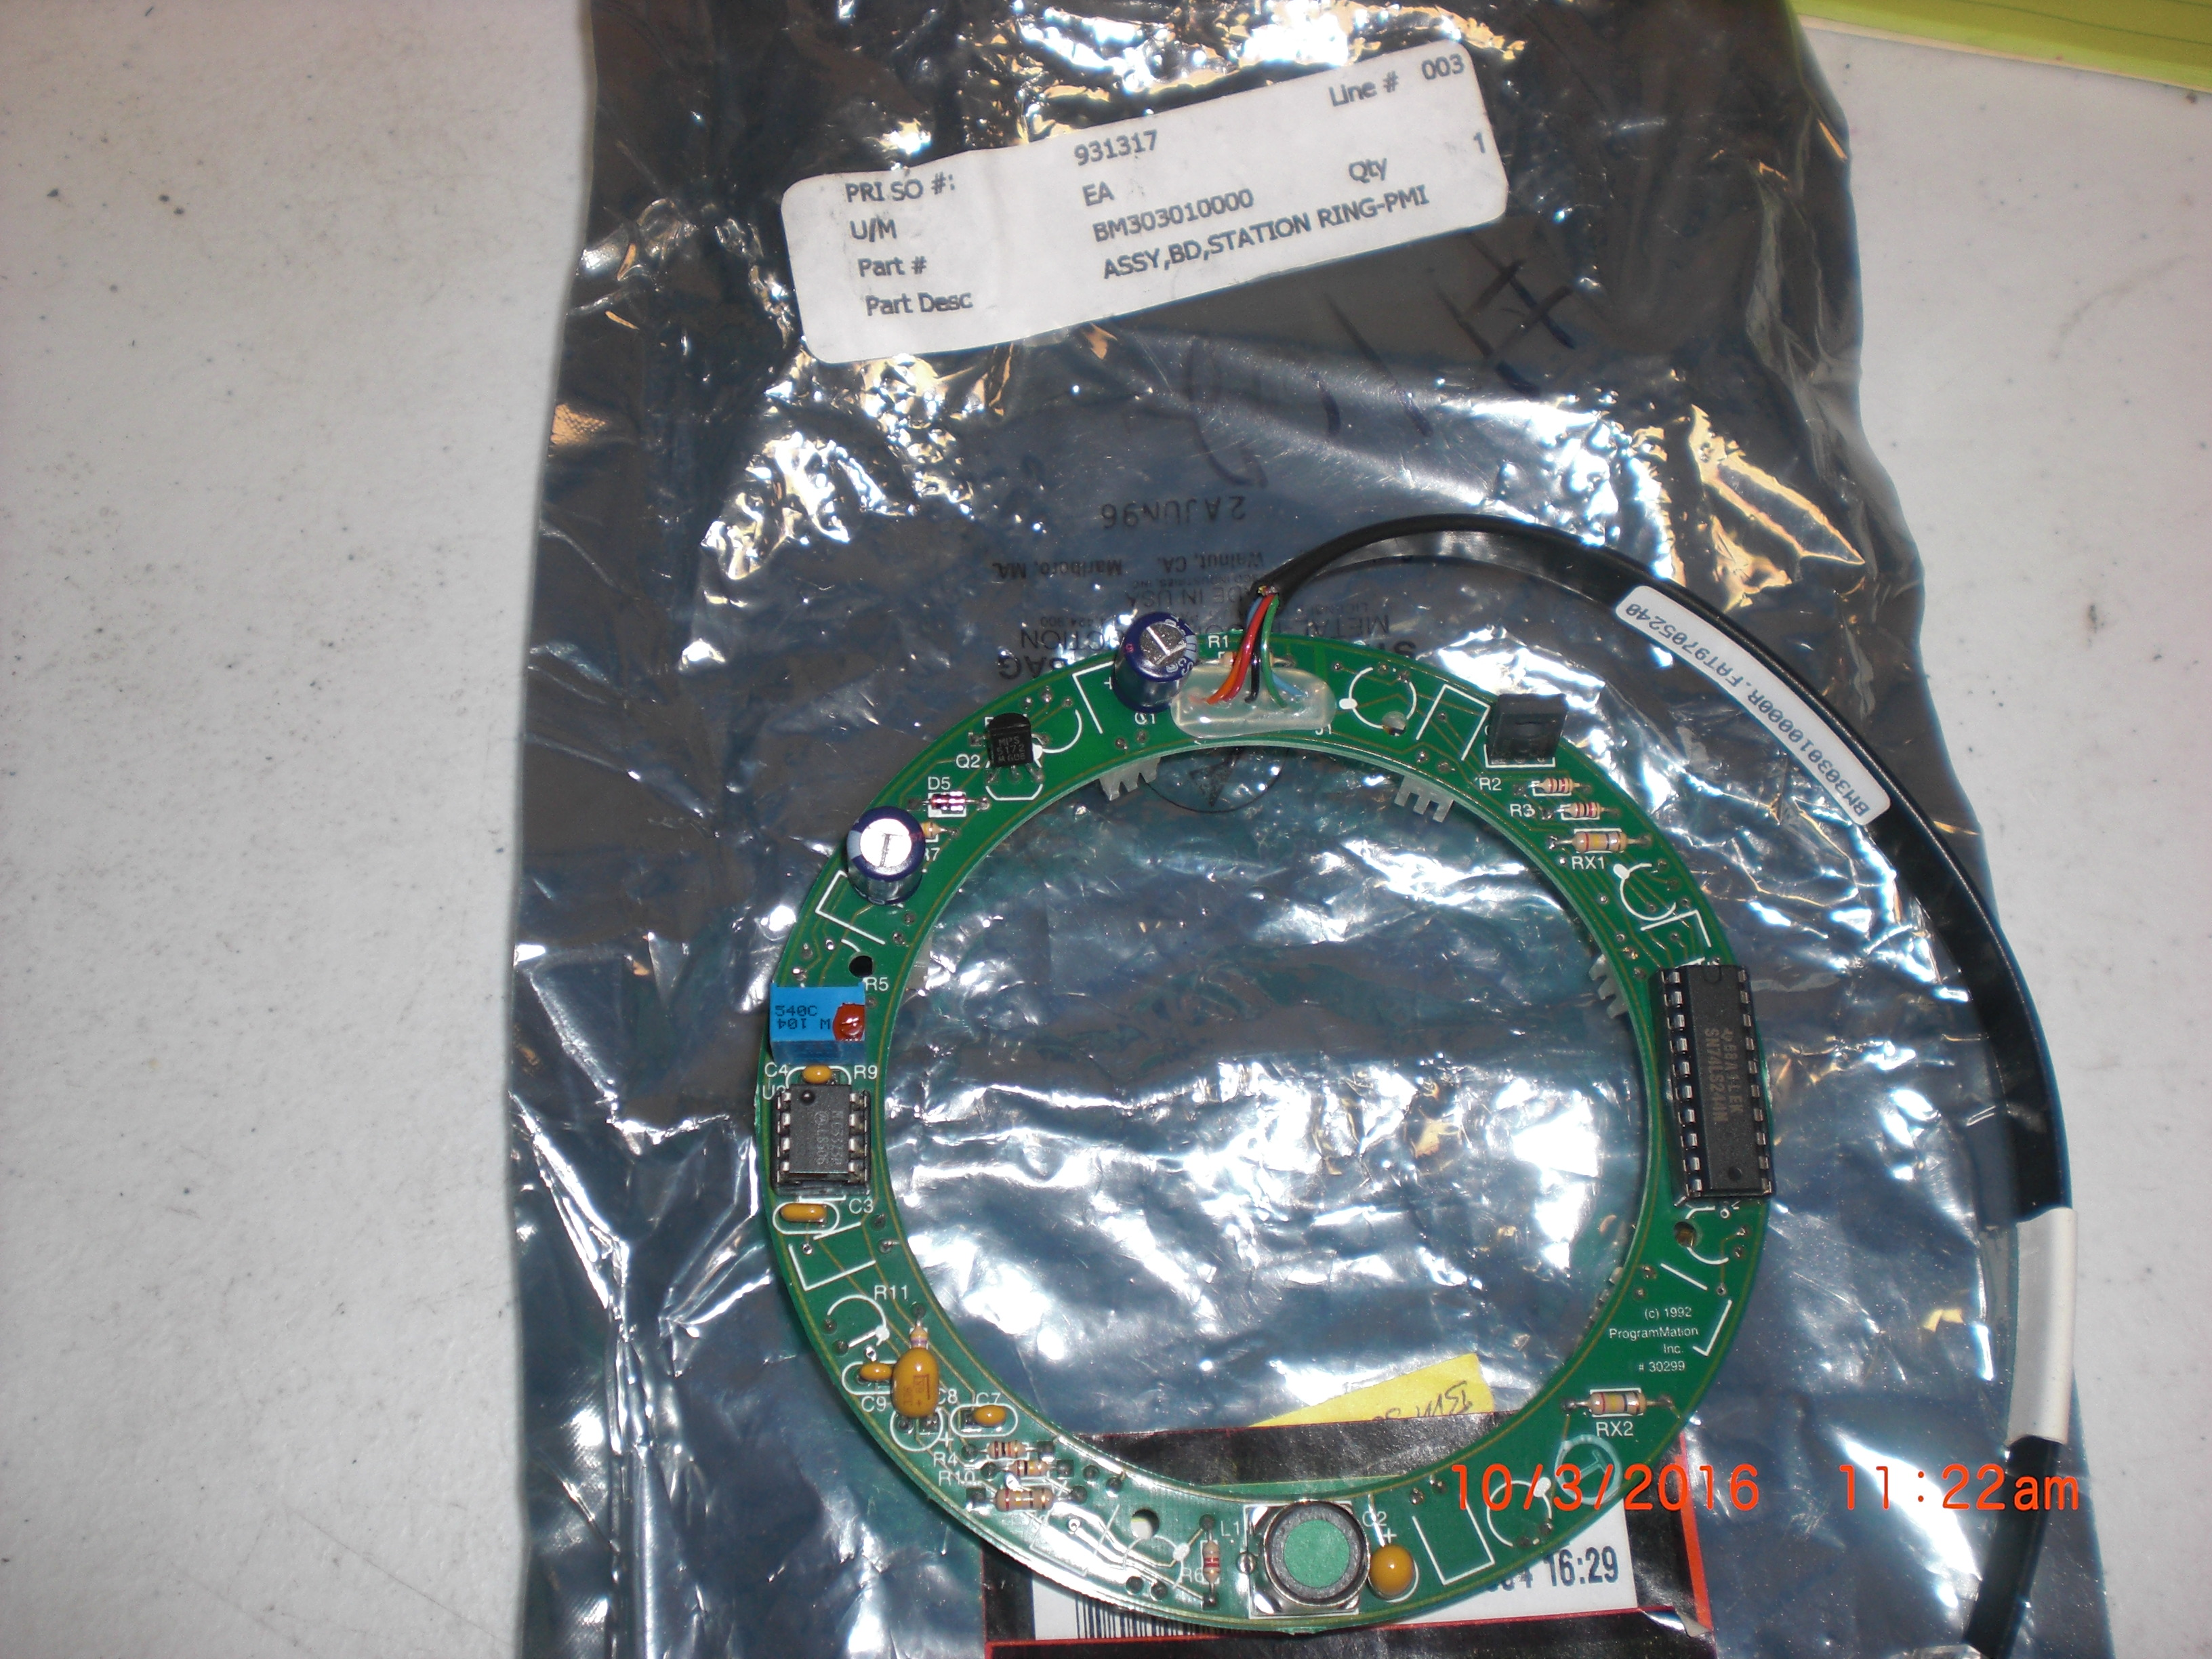 PCB BROOKS- PRI BM303010000 Assy BD Station Ring-PMI